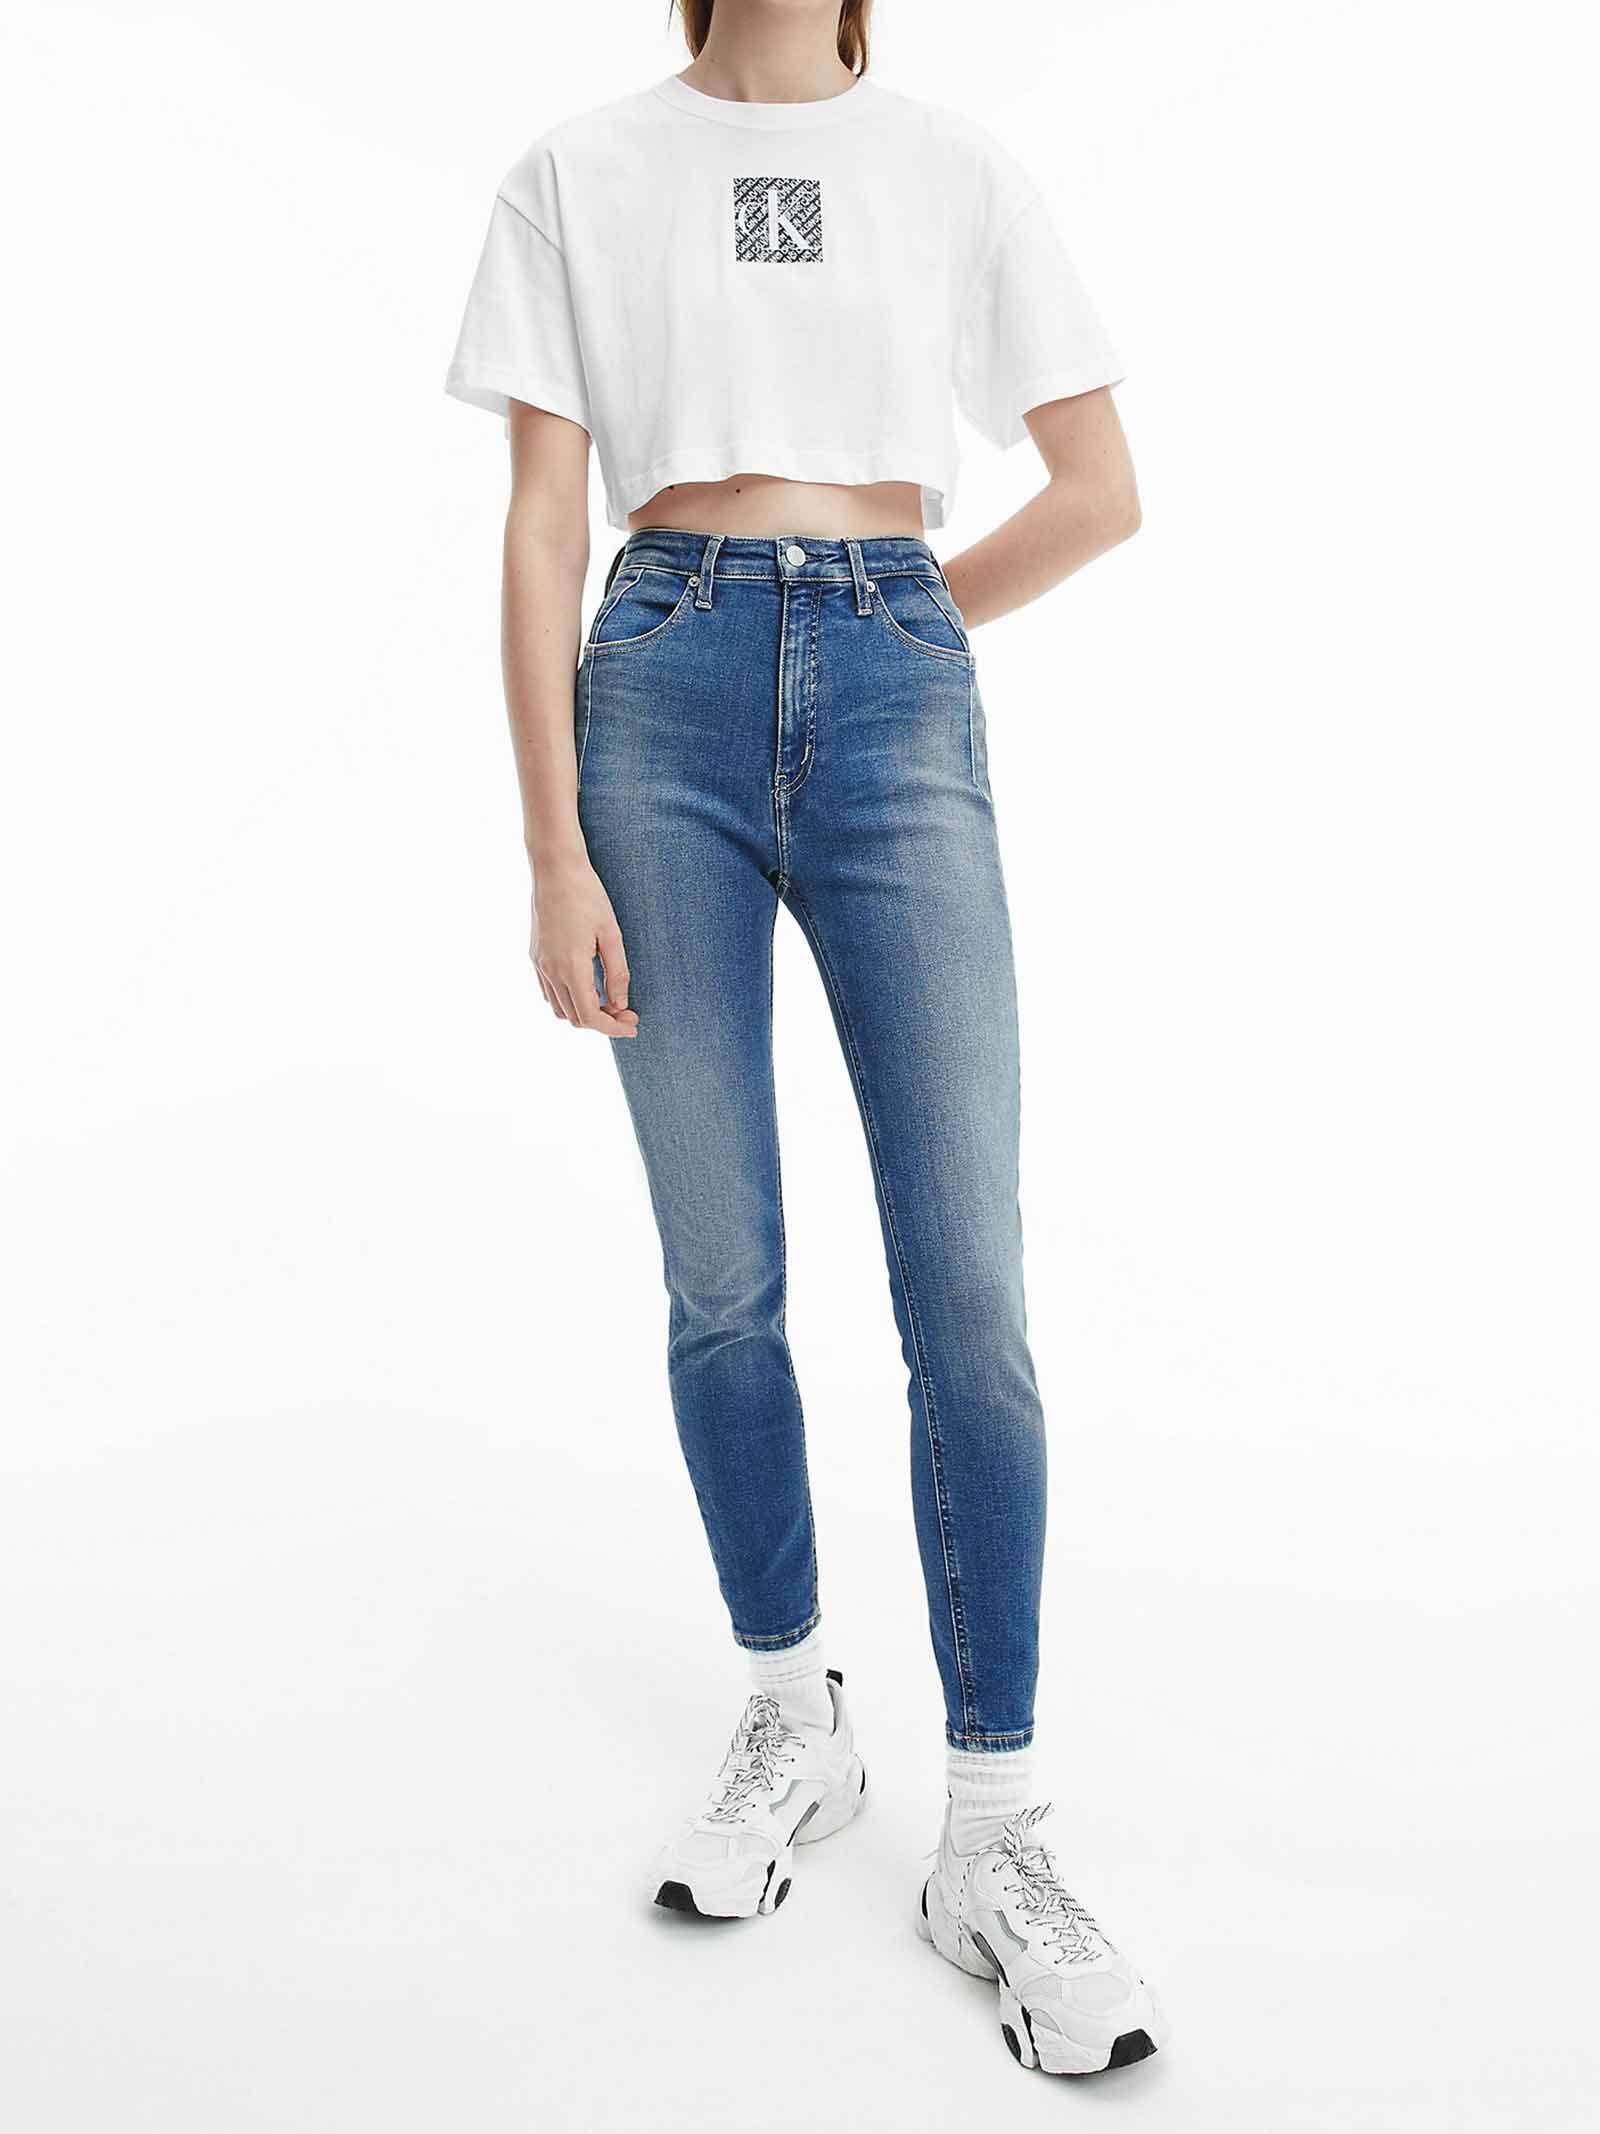 T-SHIRT DONNA CALVIN KLEIN | T-shirt | J20J215612YAF